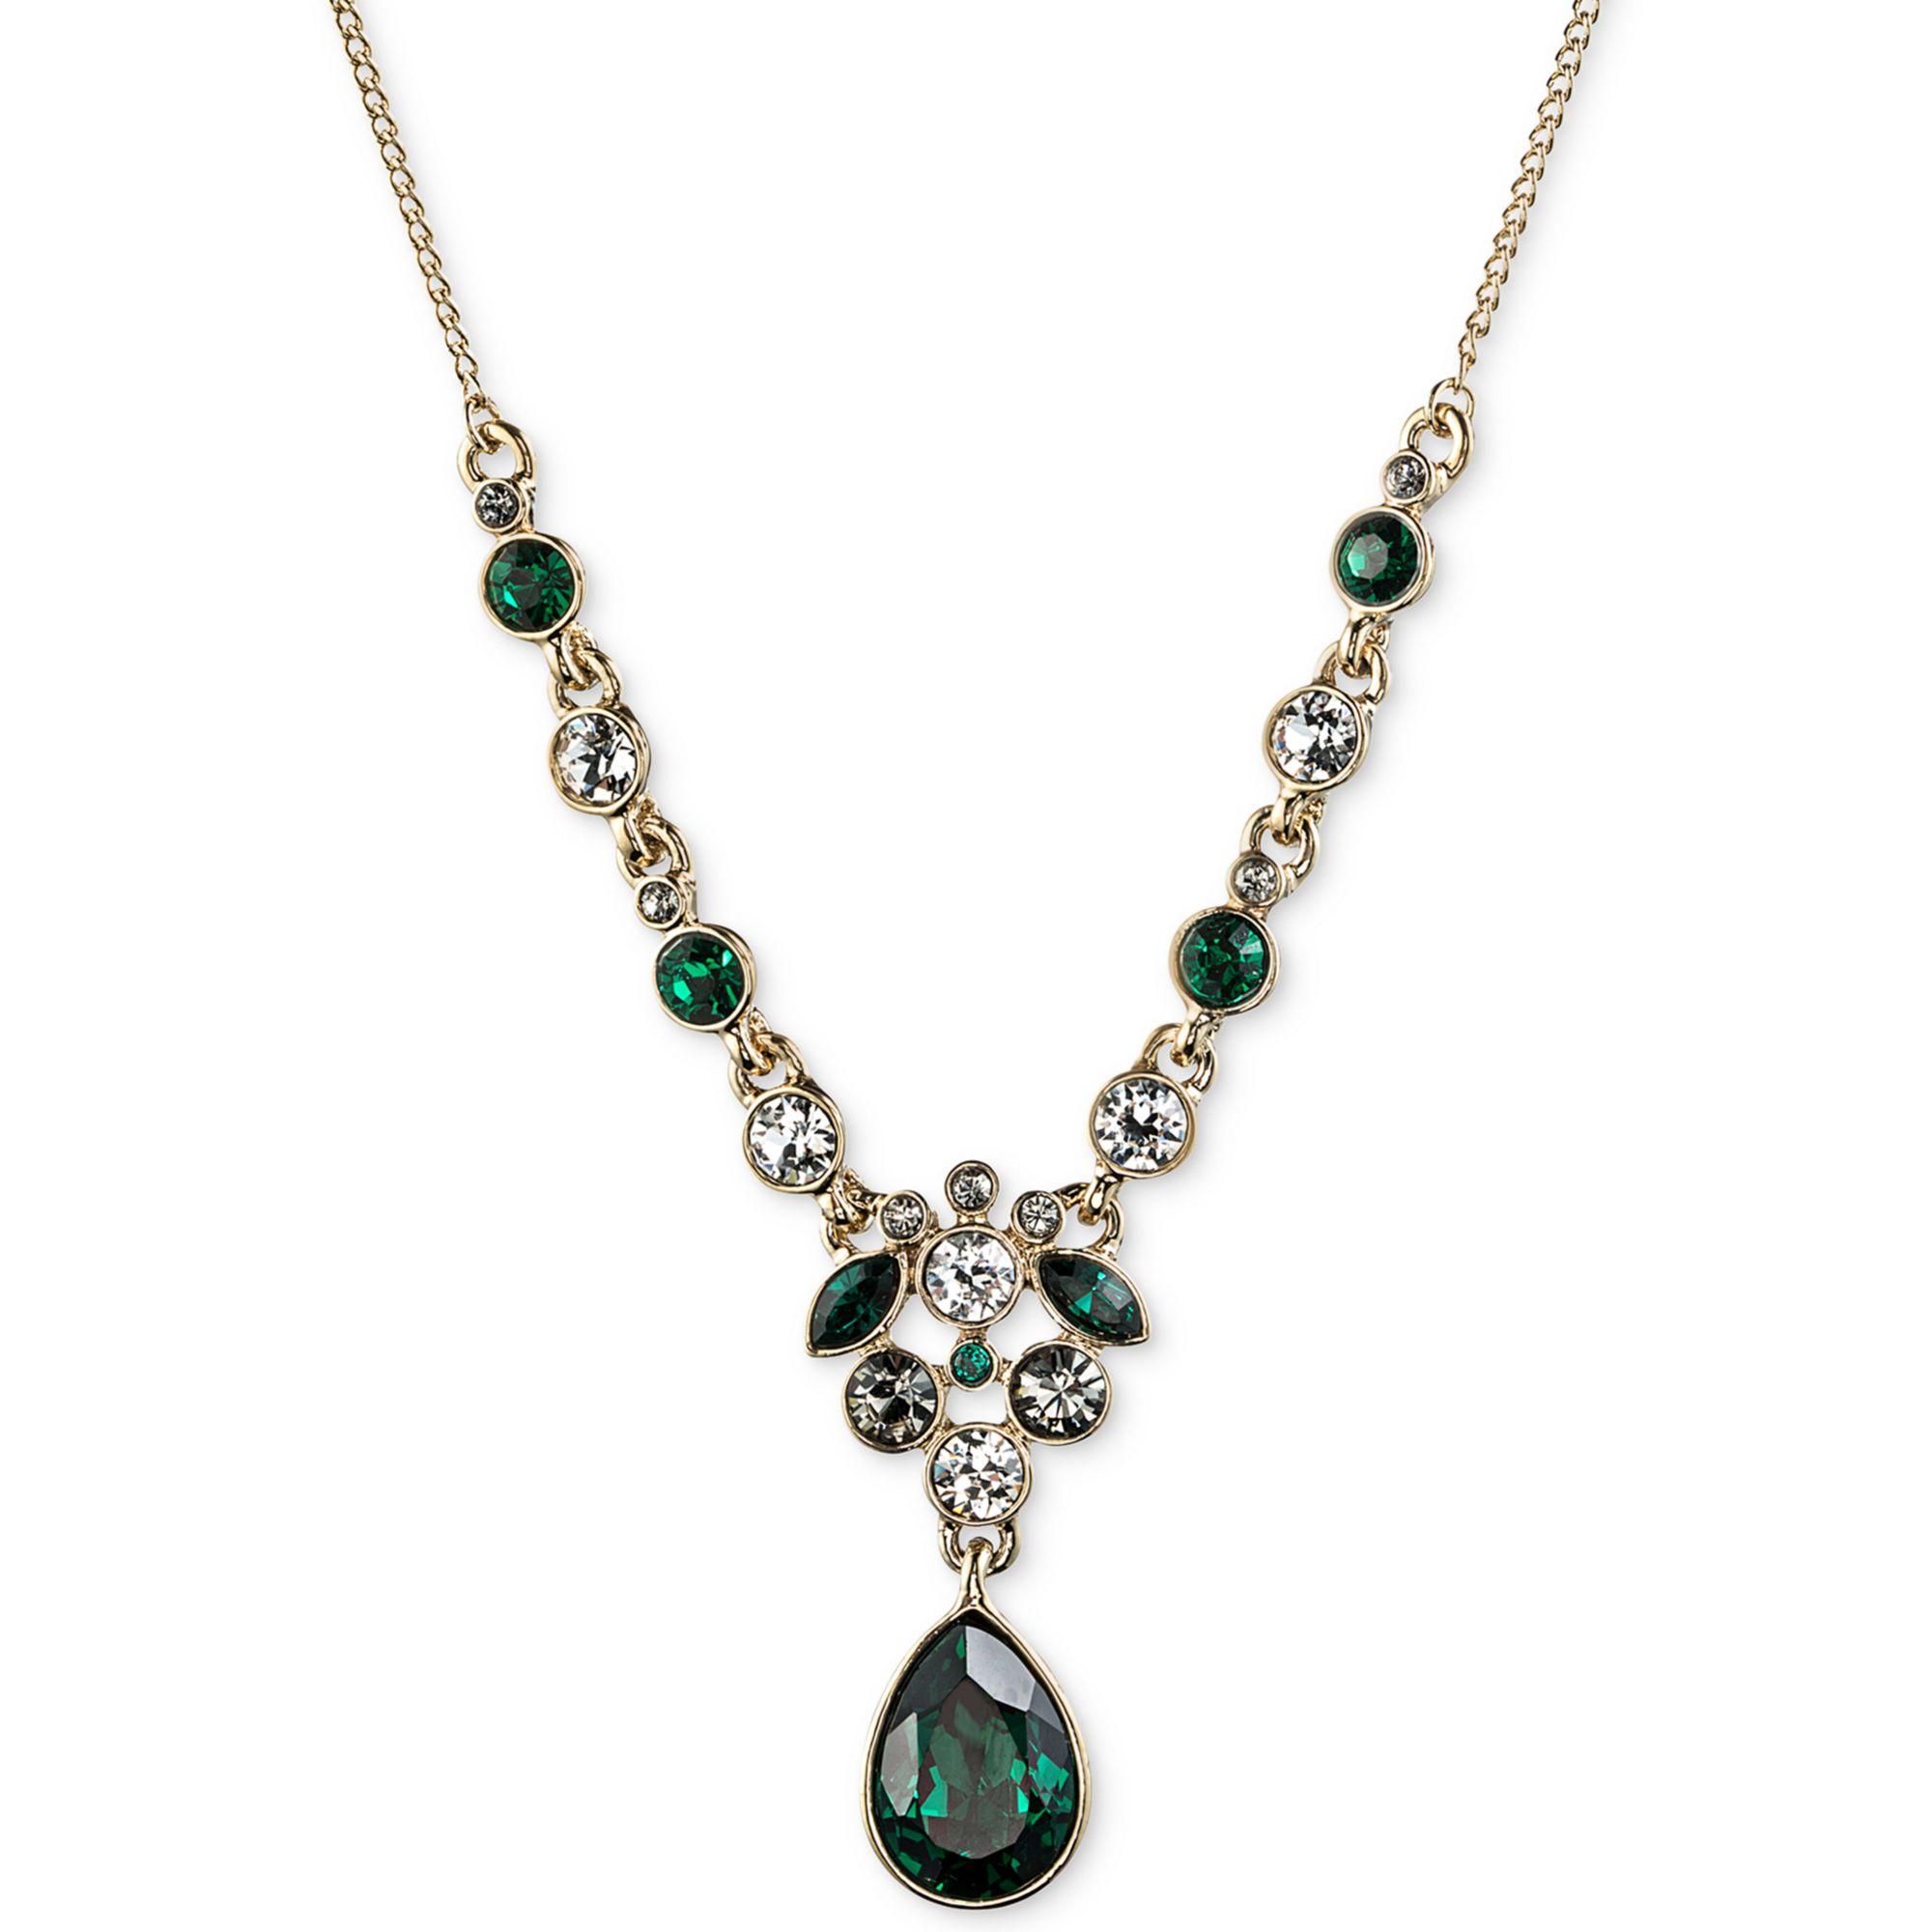 givenchy hematitetone emeraldcolored and swarovski